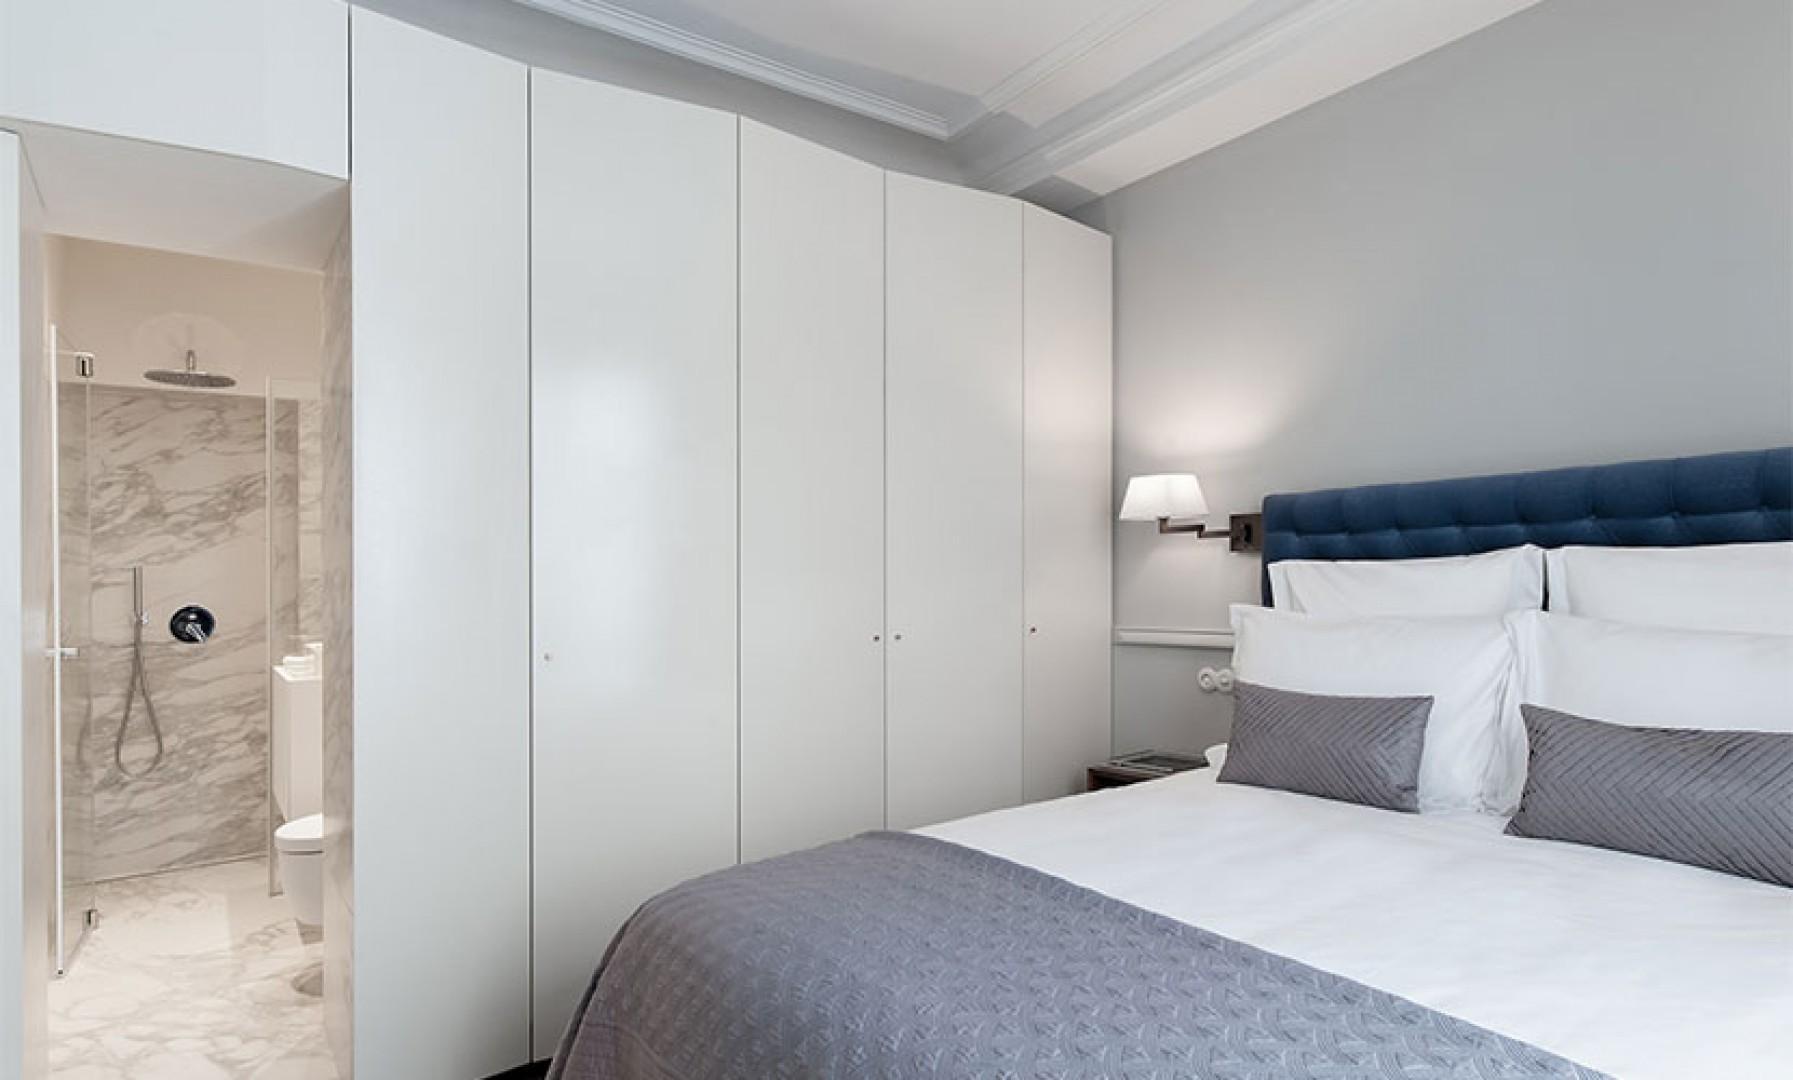 The bedroom comes with an en suite bathroom.